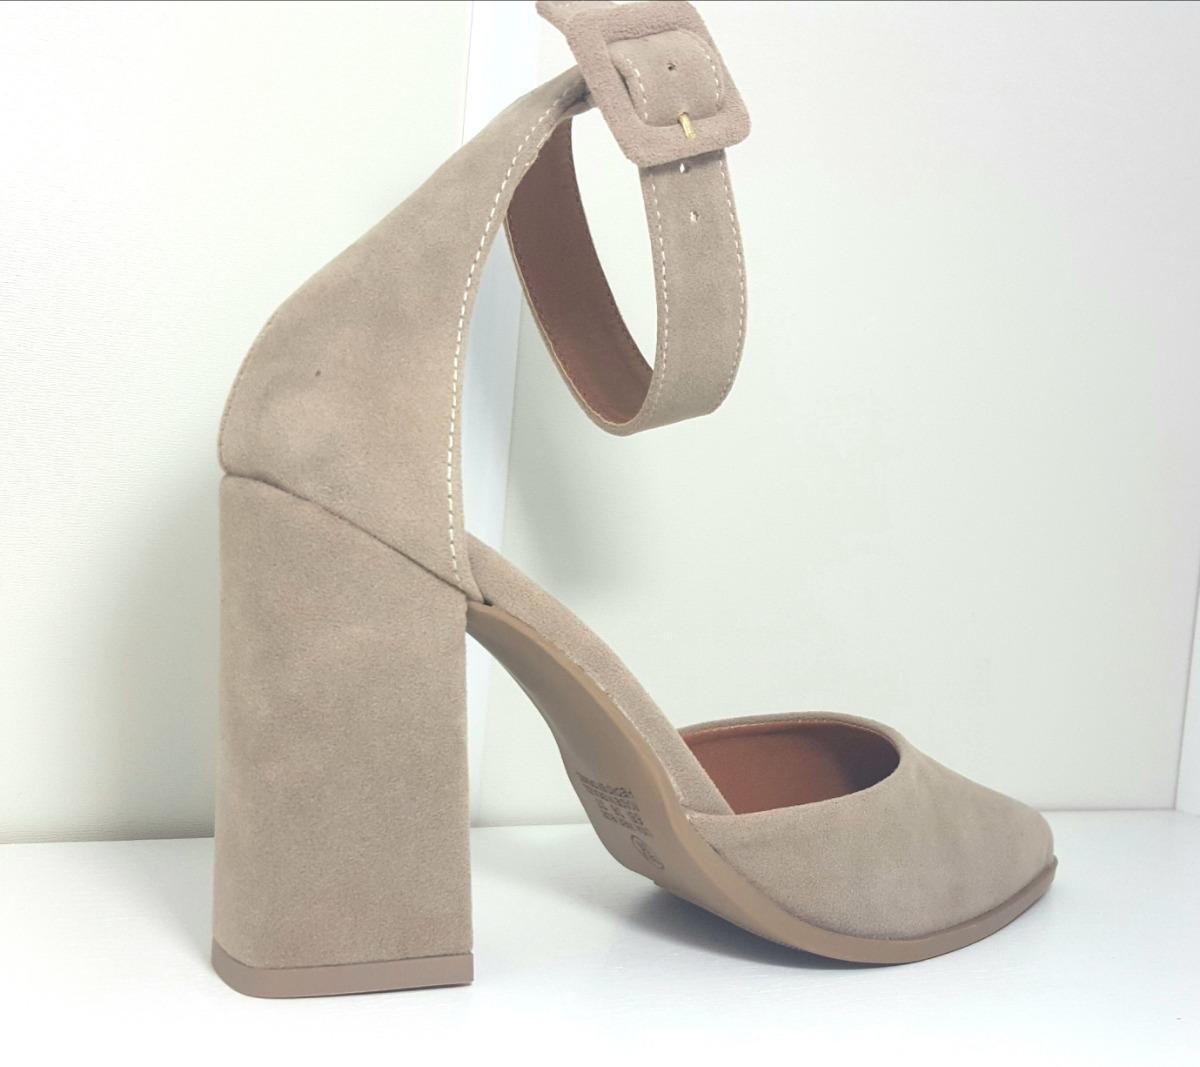 f07ce8d5bc sapato feminino scarpins fechado bico fino salto grosso top. Carregando  zoom.